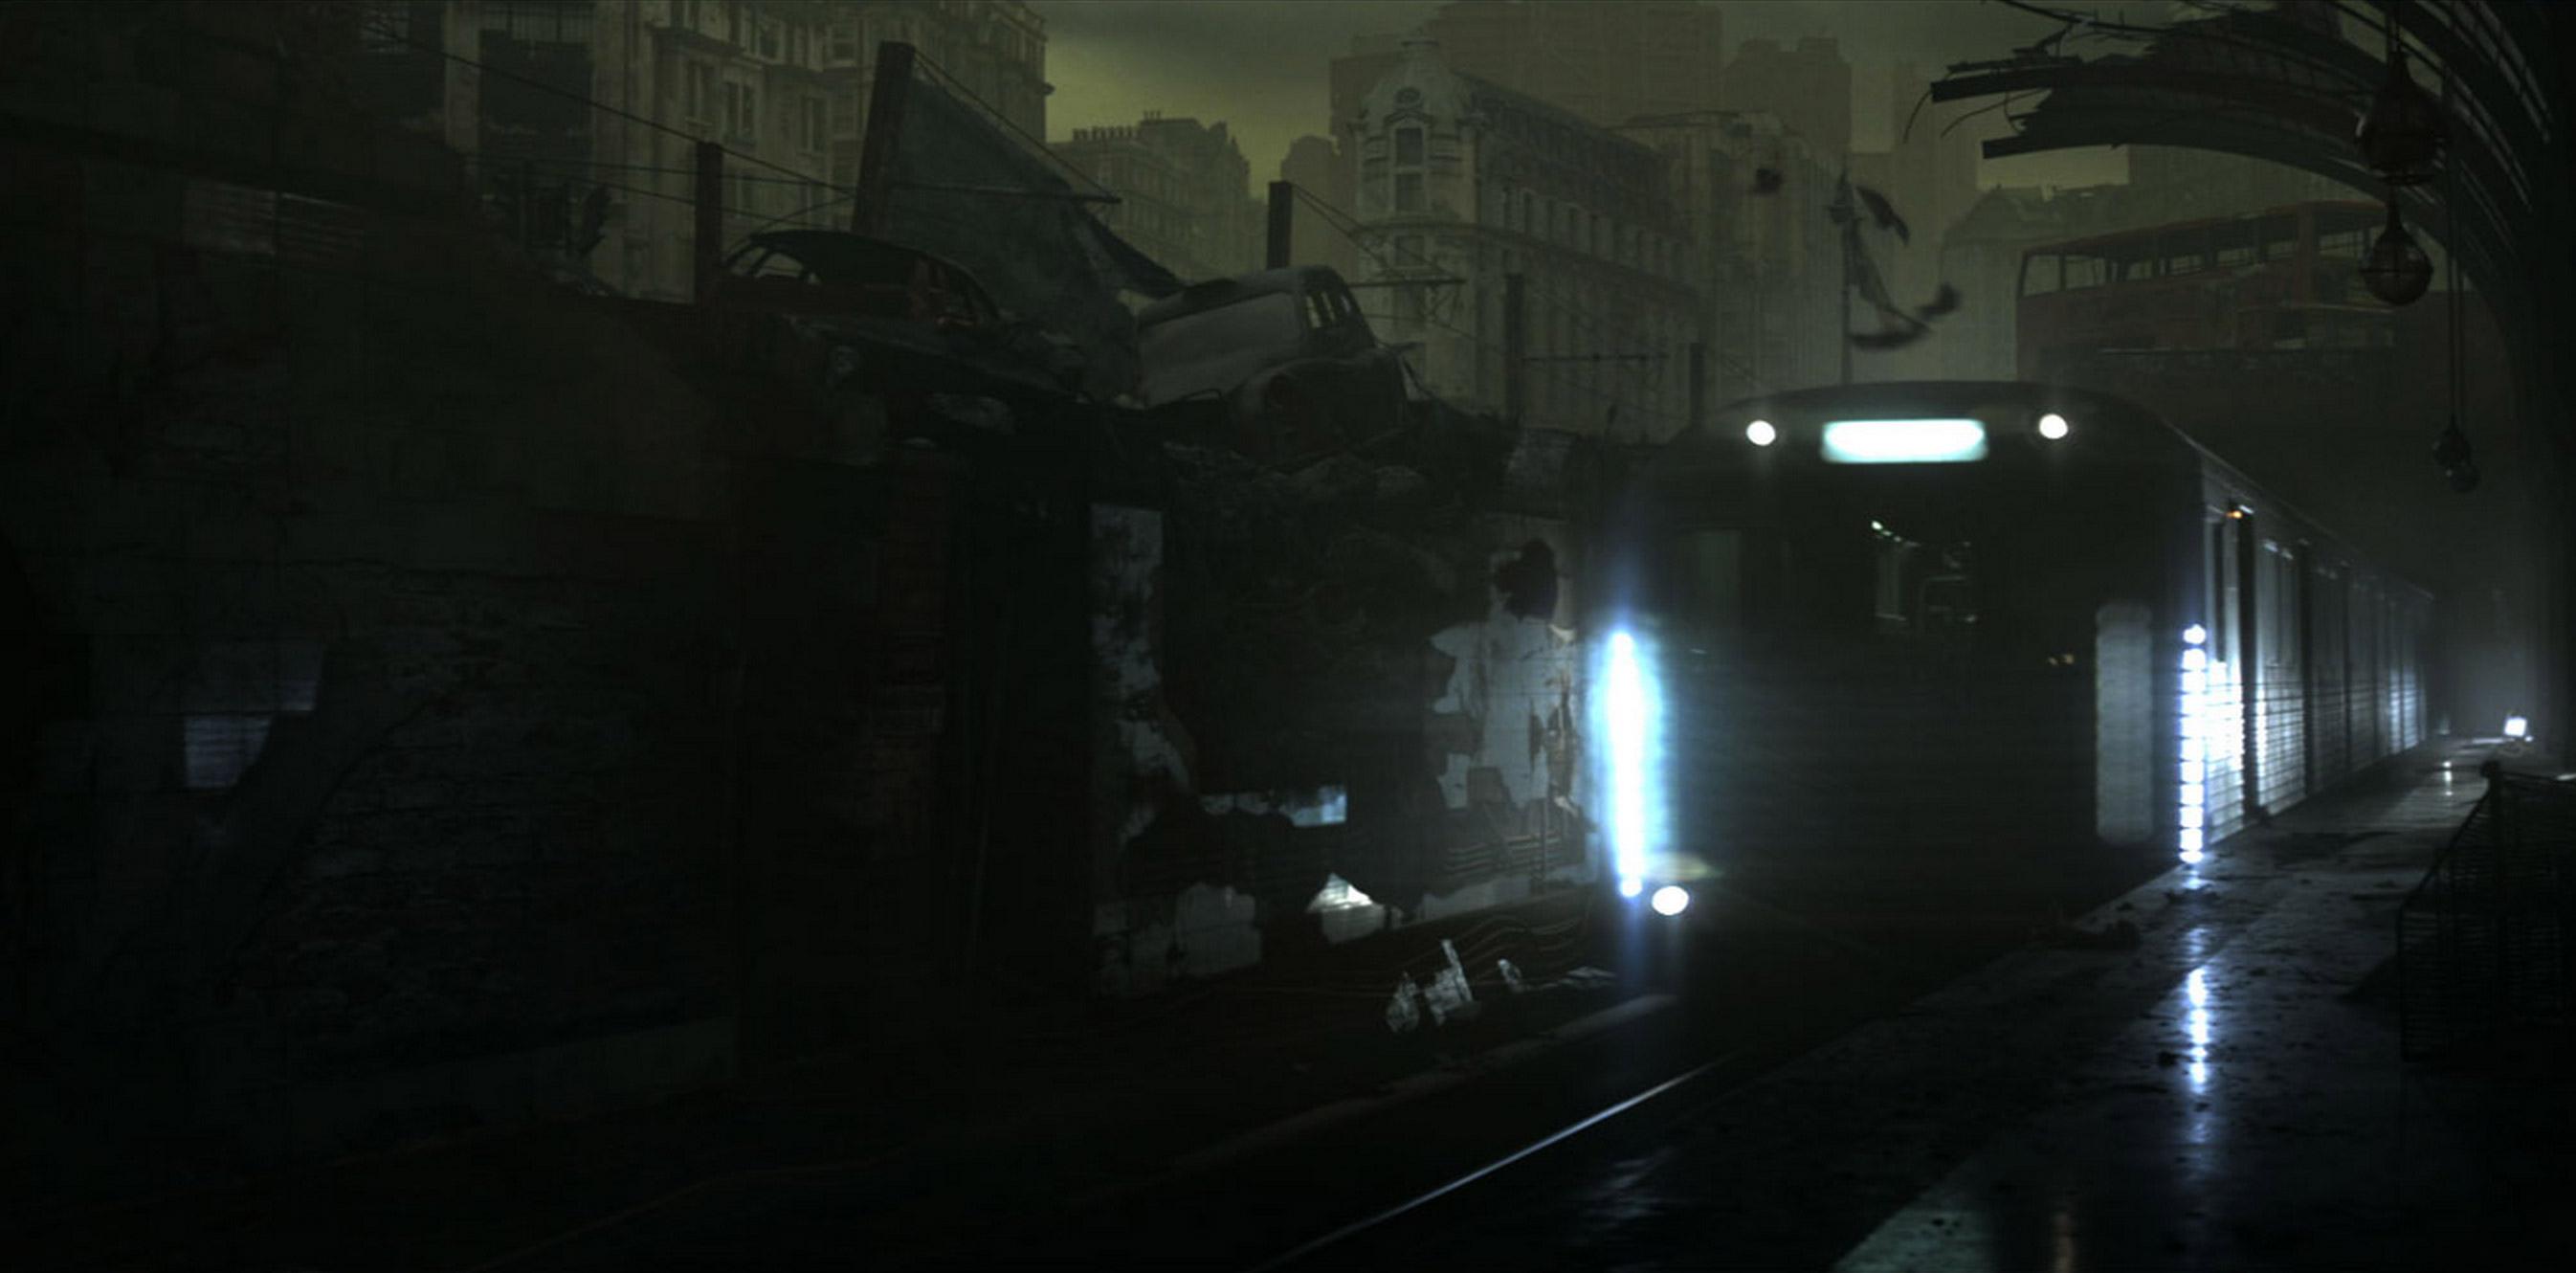 Final scene